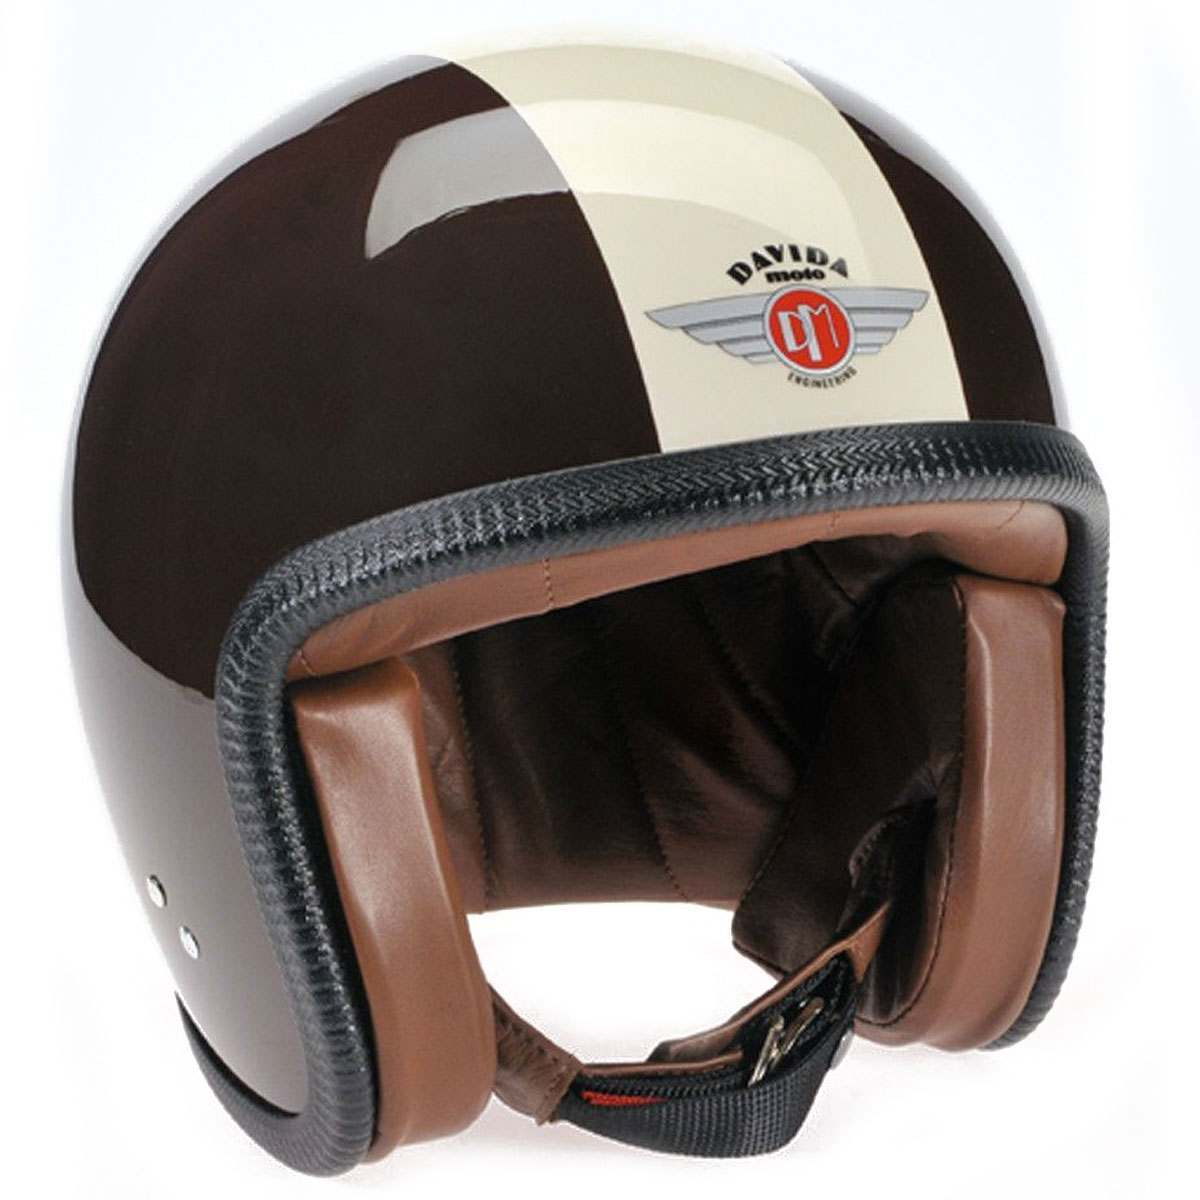 Davida 92 Helmet